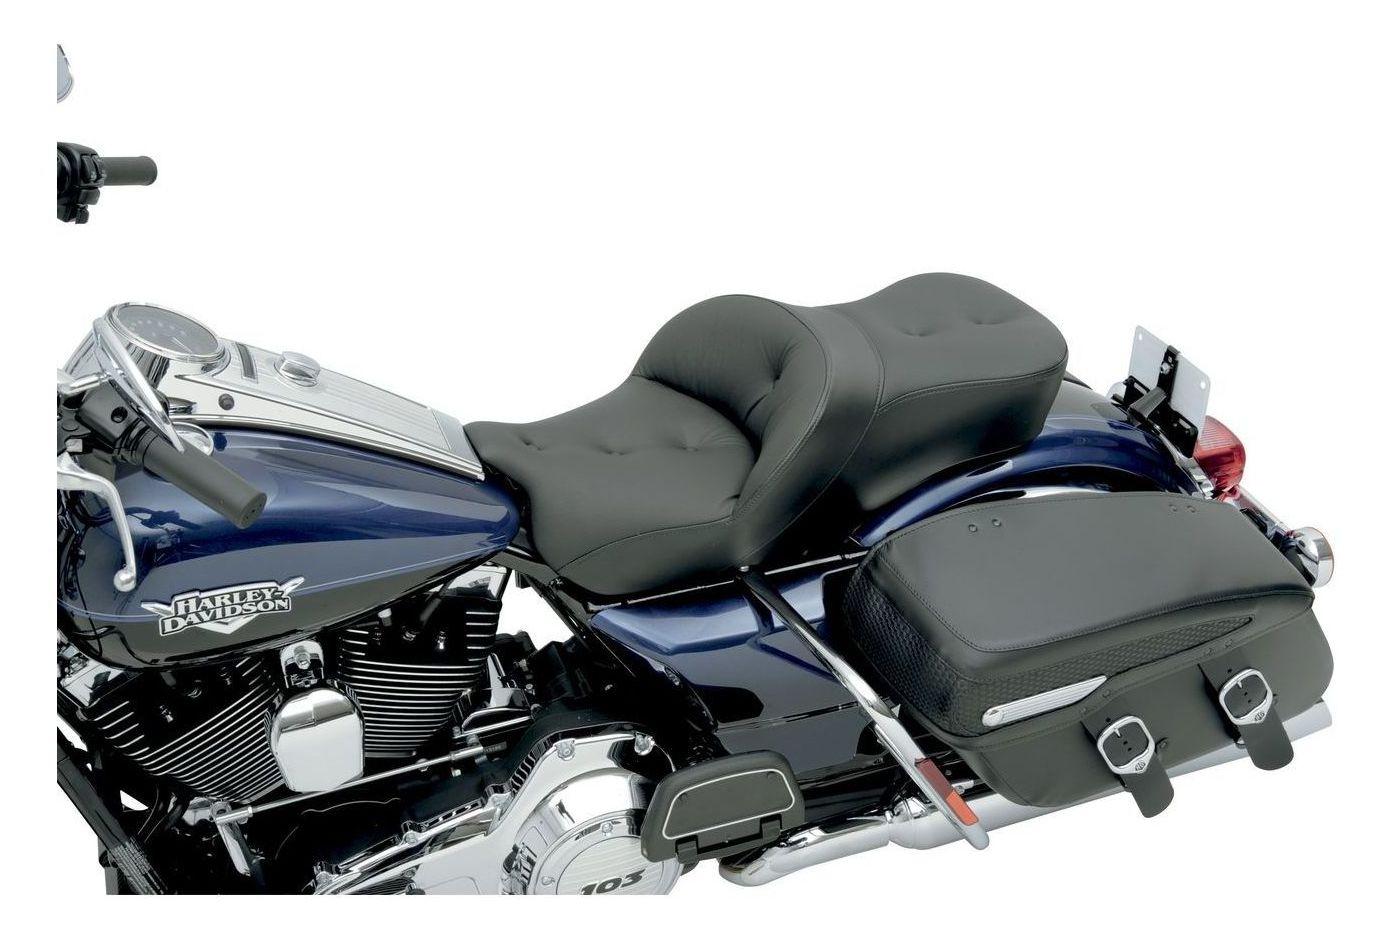 Genial Saddlemen Road Sofa Seat For Harley Touring 2008 2013 | 20% ($140.79) Off!    RevZilla